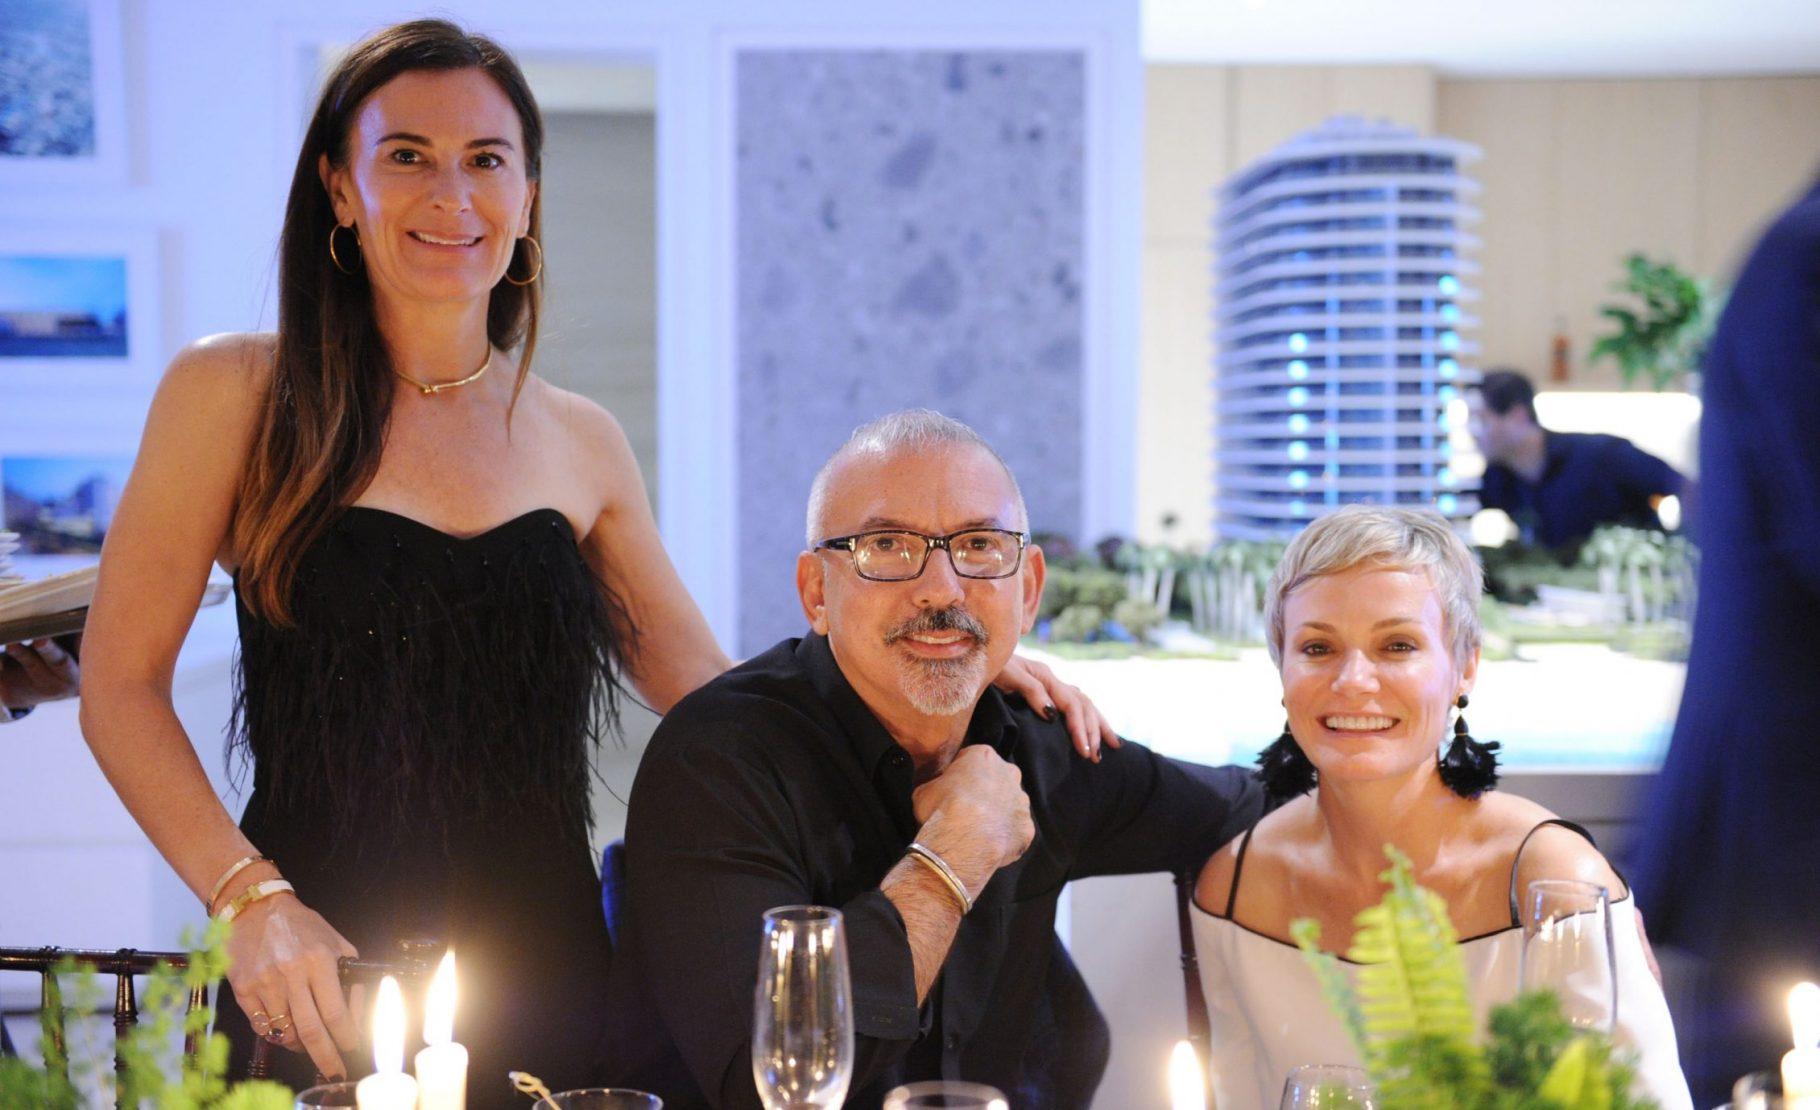 Sarah Harrelson, Carlos Suarez and Lori Suarez